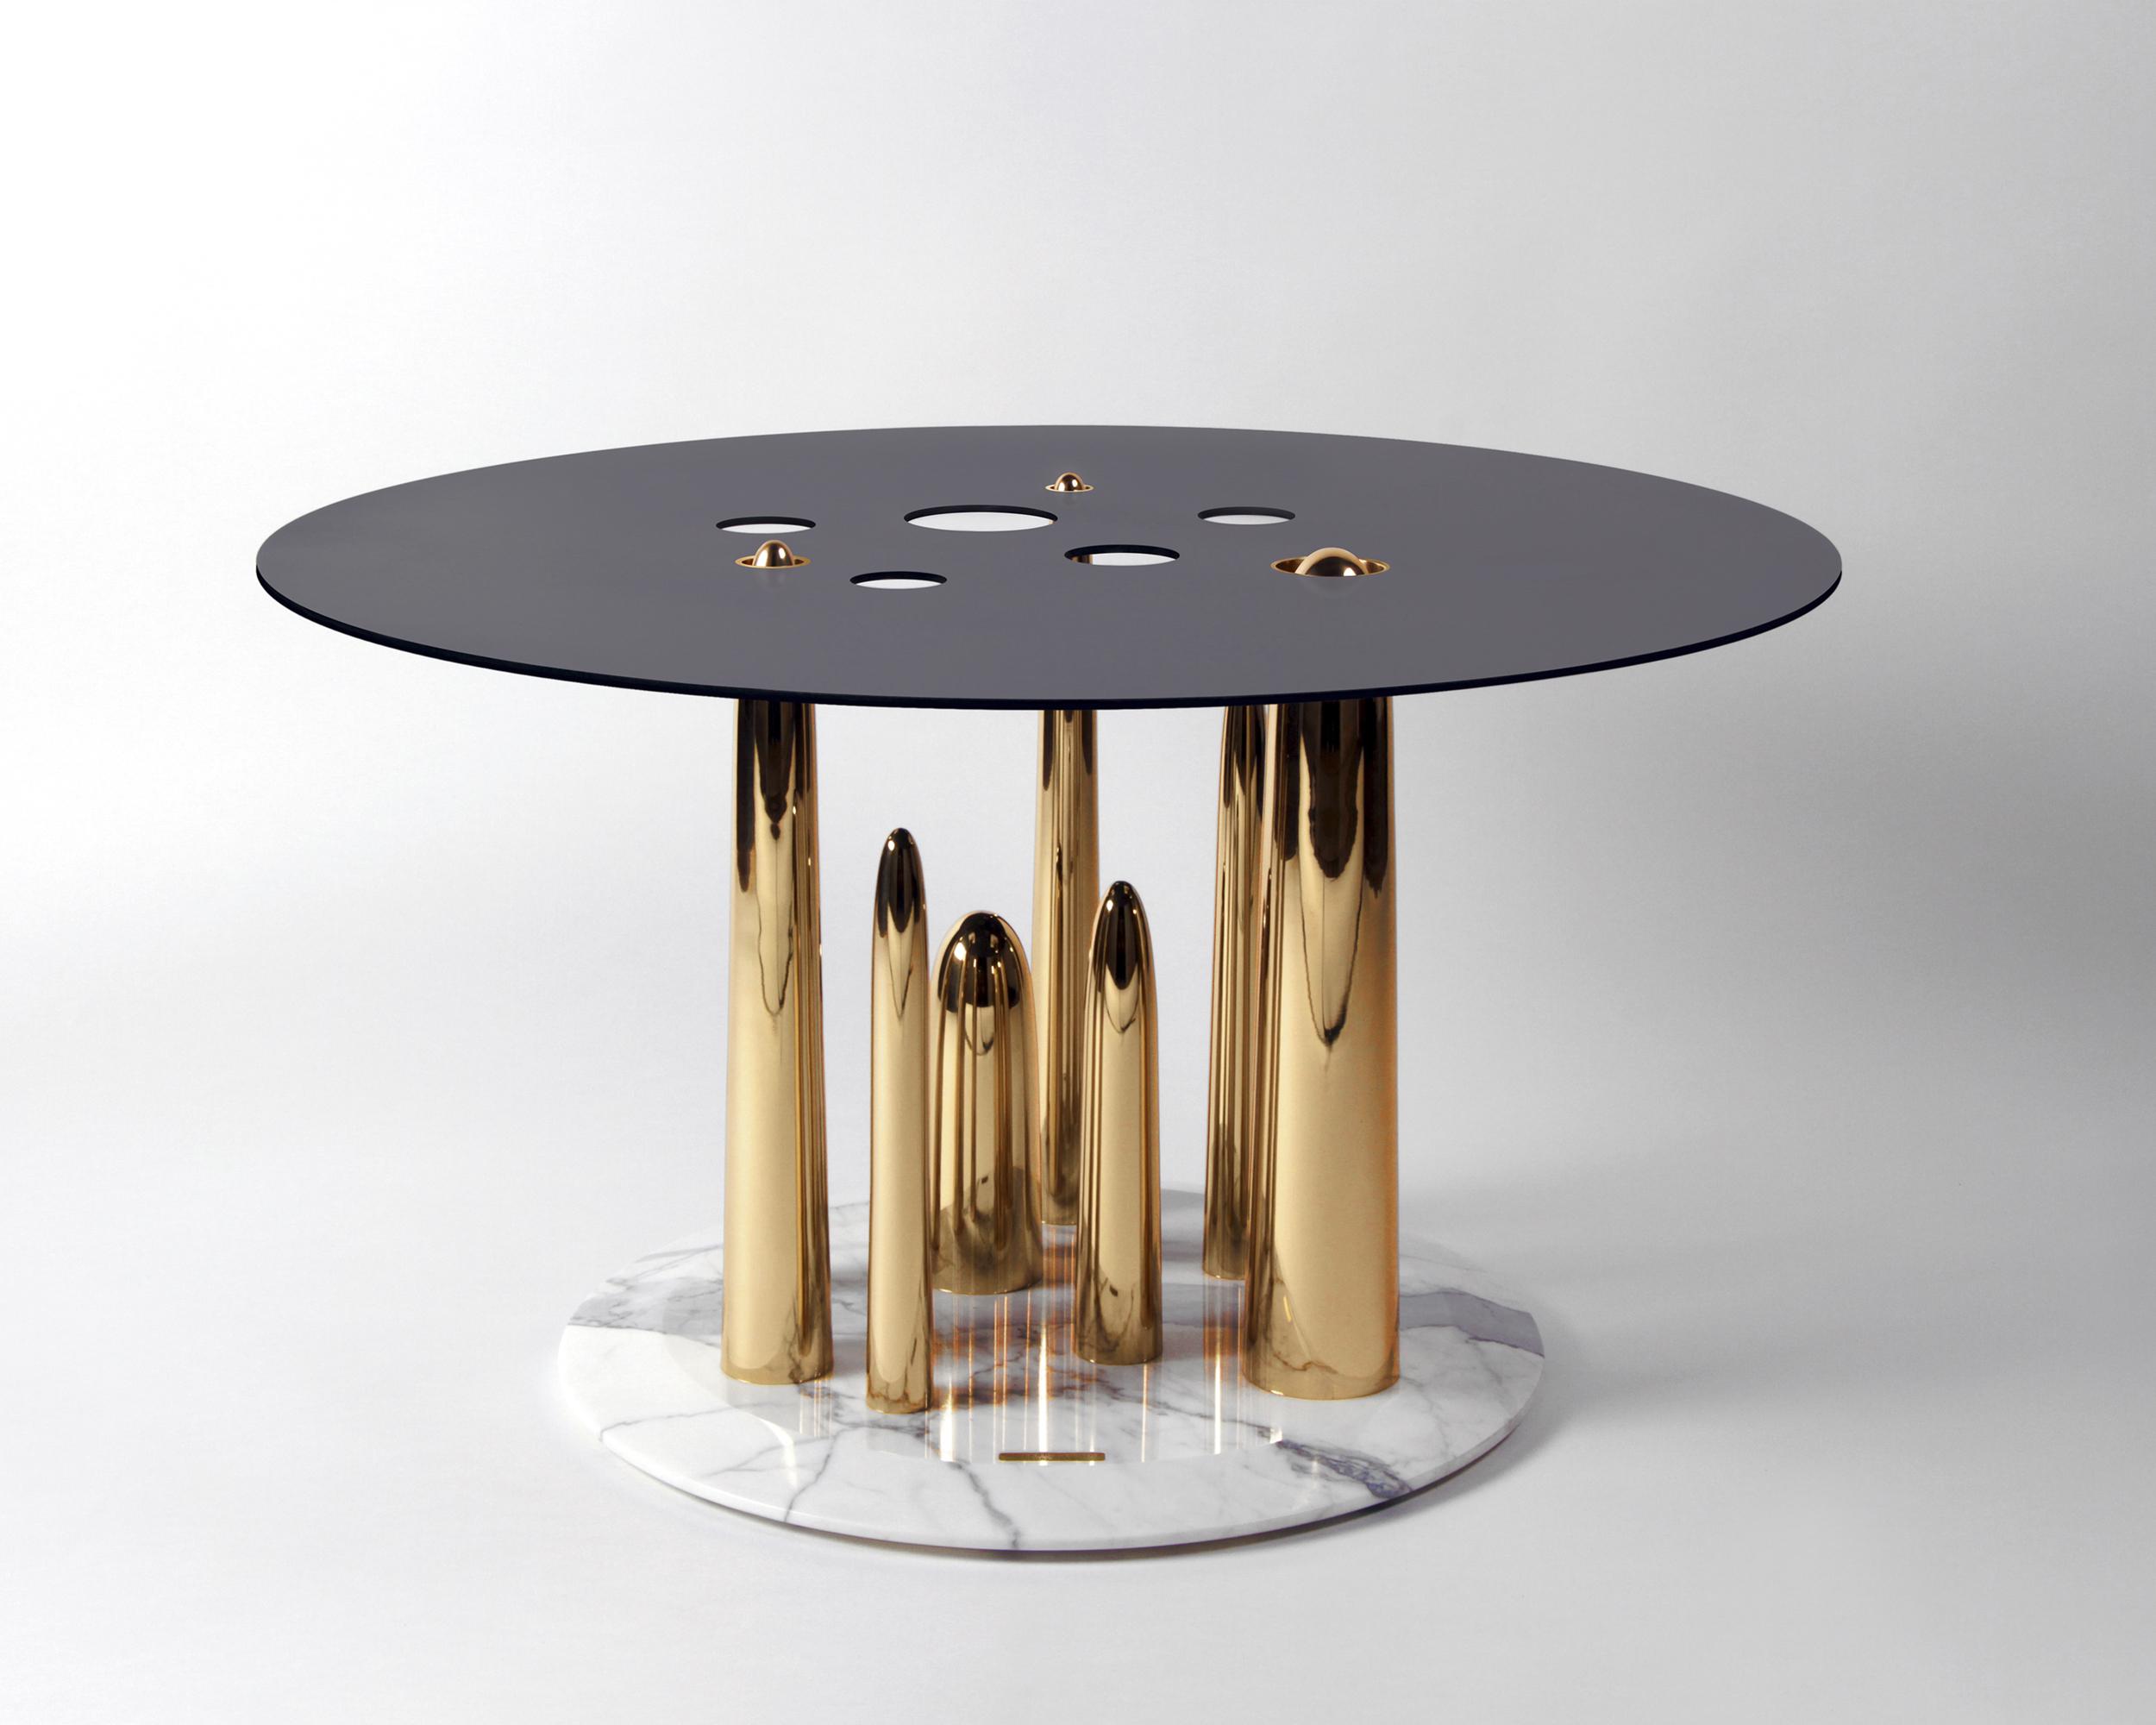 GloryHoles-Table-Richard-Yasmine-Design-Savannah-Bay-Gallery